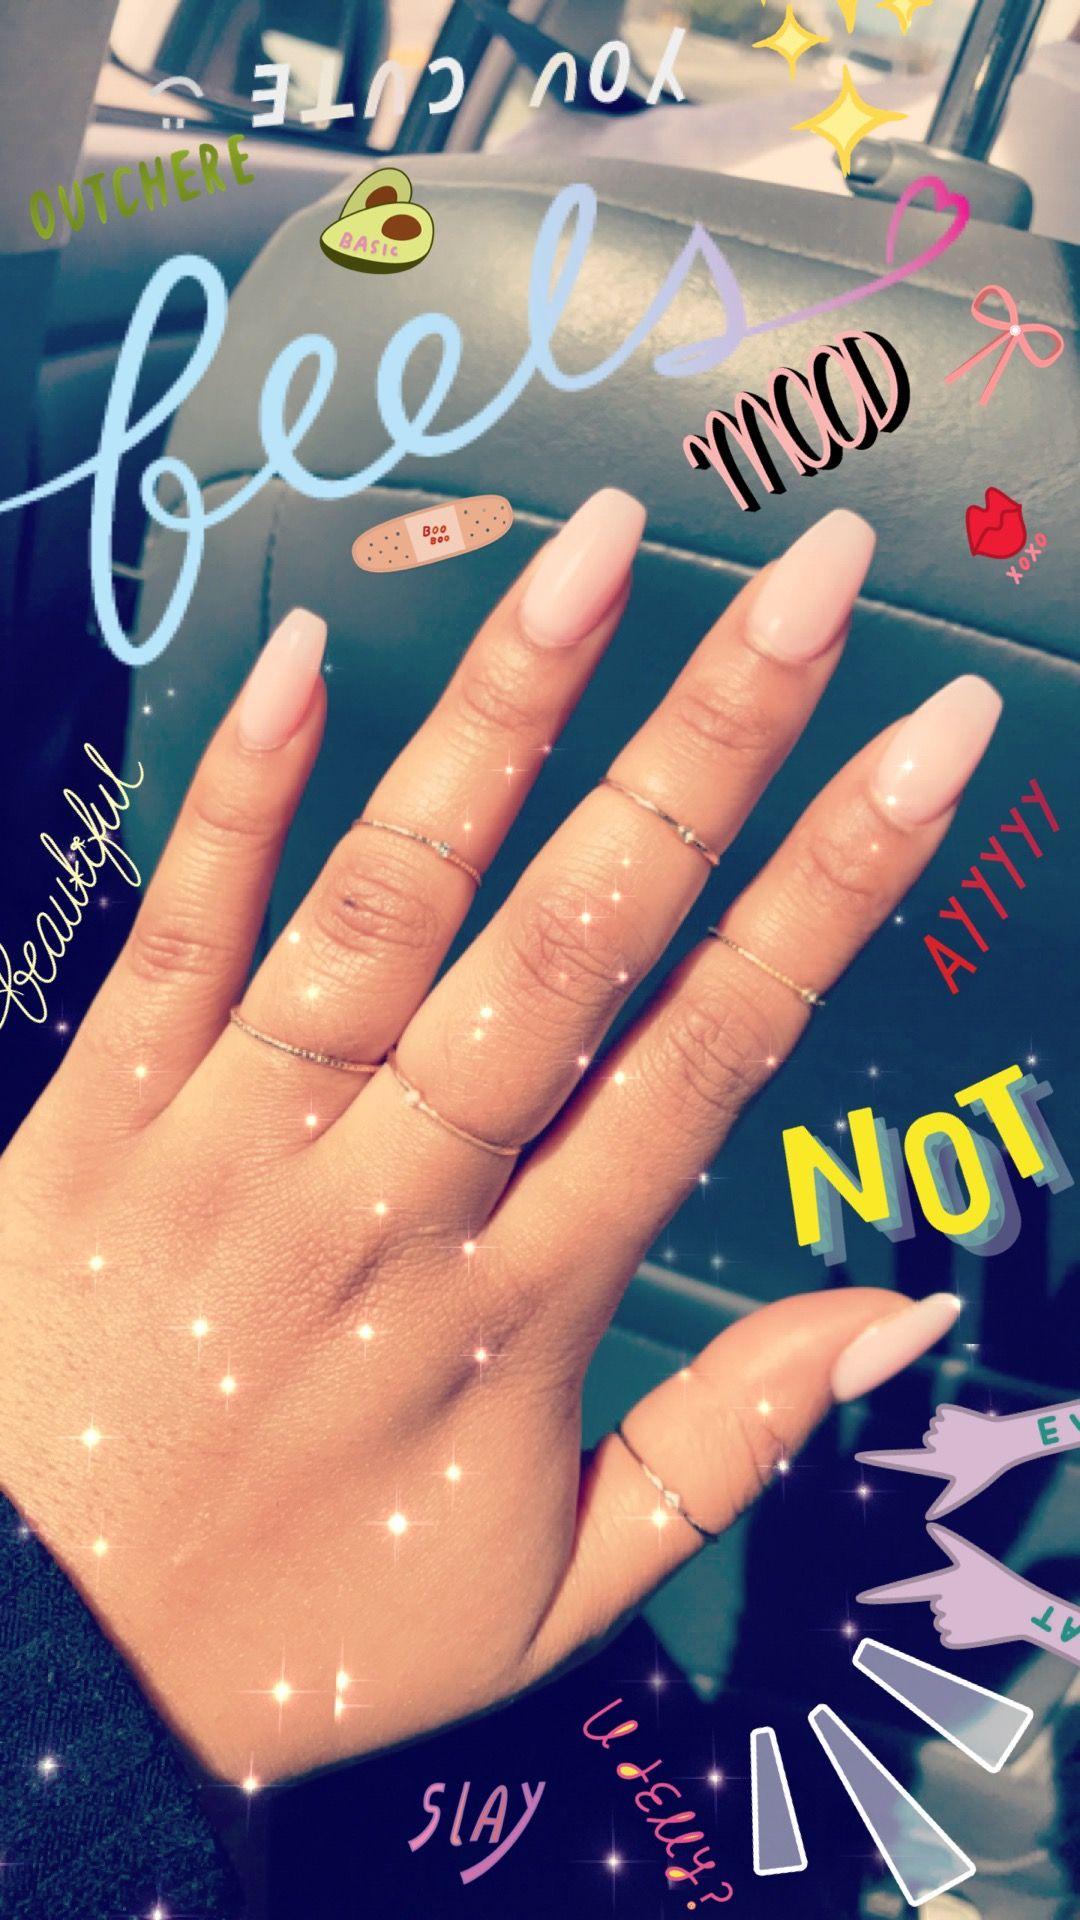 Bubble Bath Opi Gel Nails Eshee Nails Austin Tx Beauty